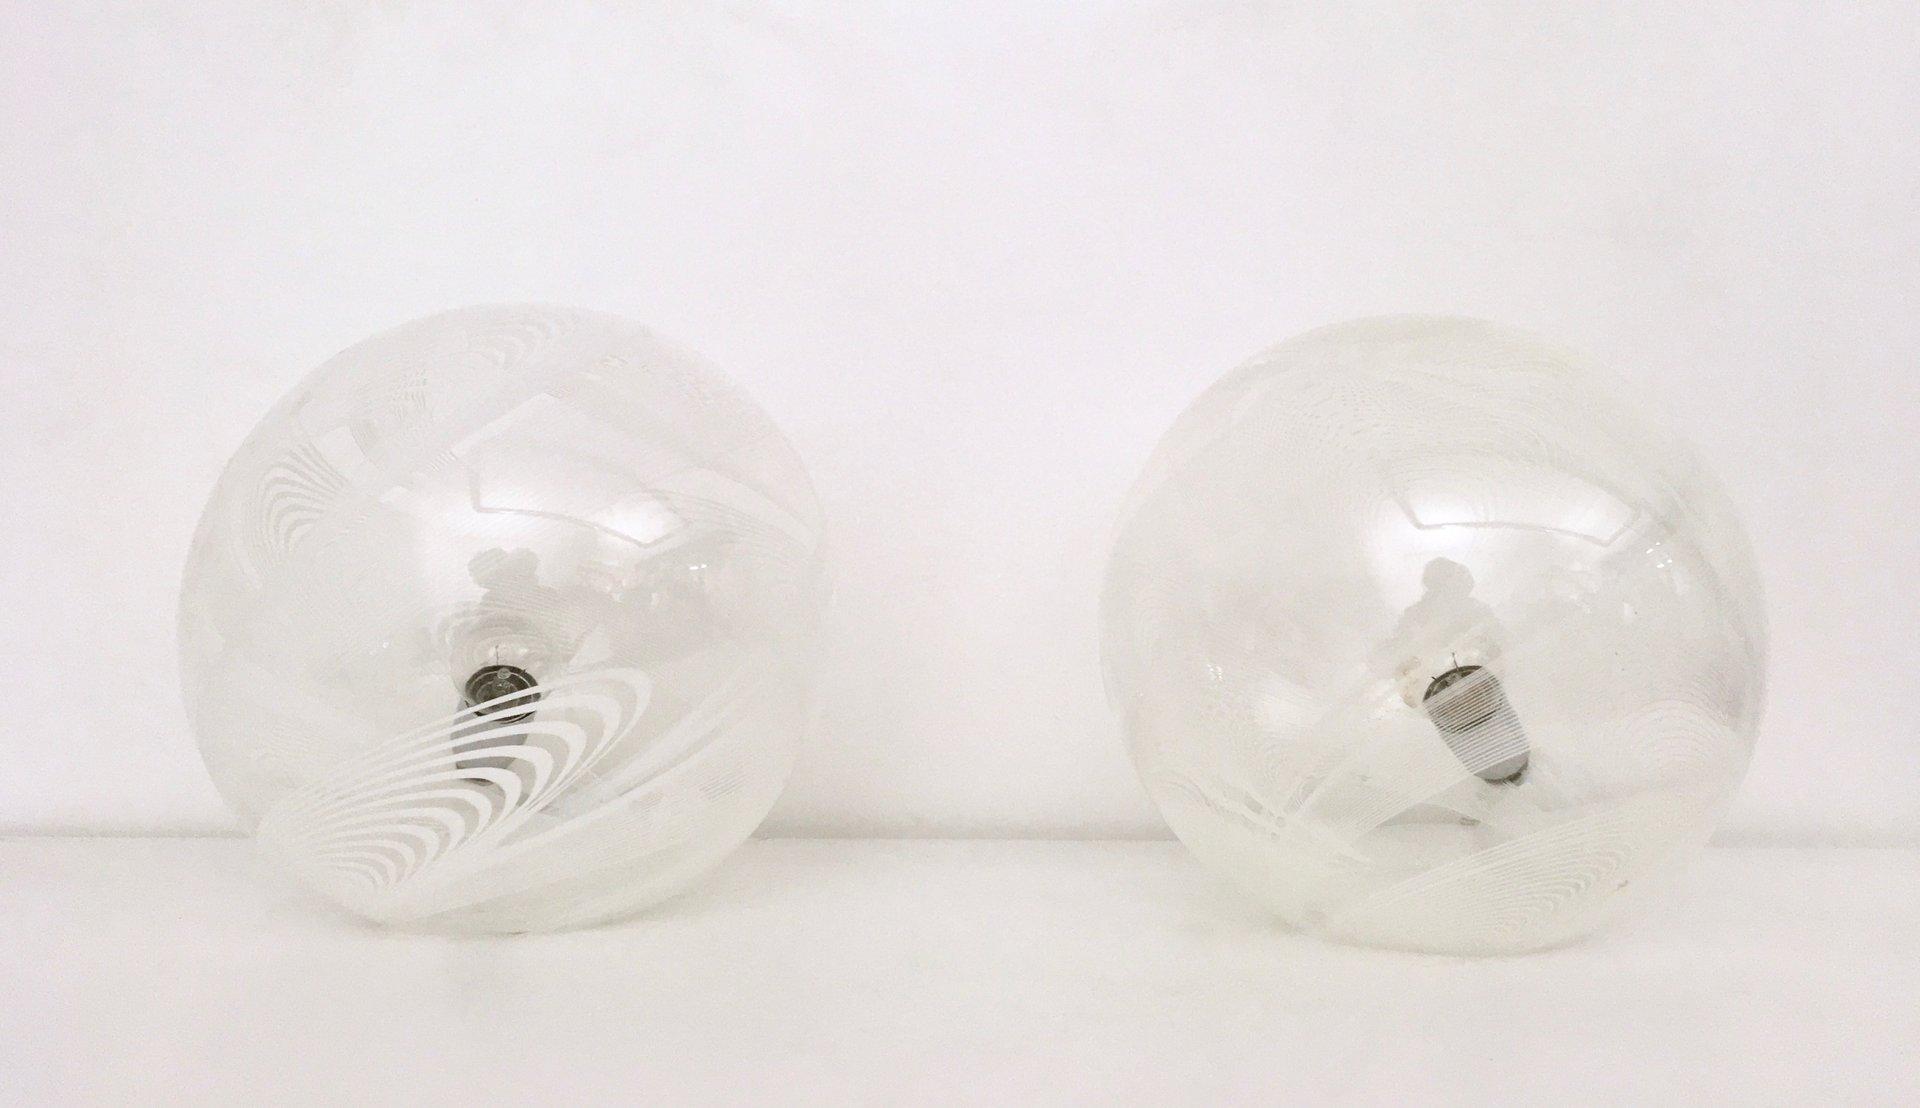 Runde Tischlampen aus Mundgeblasenem Glas, 1970er, 2er Set